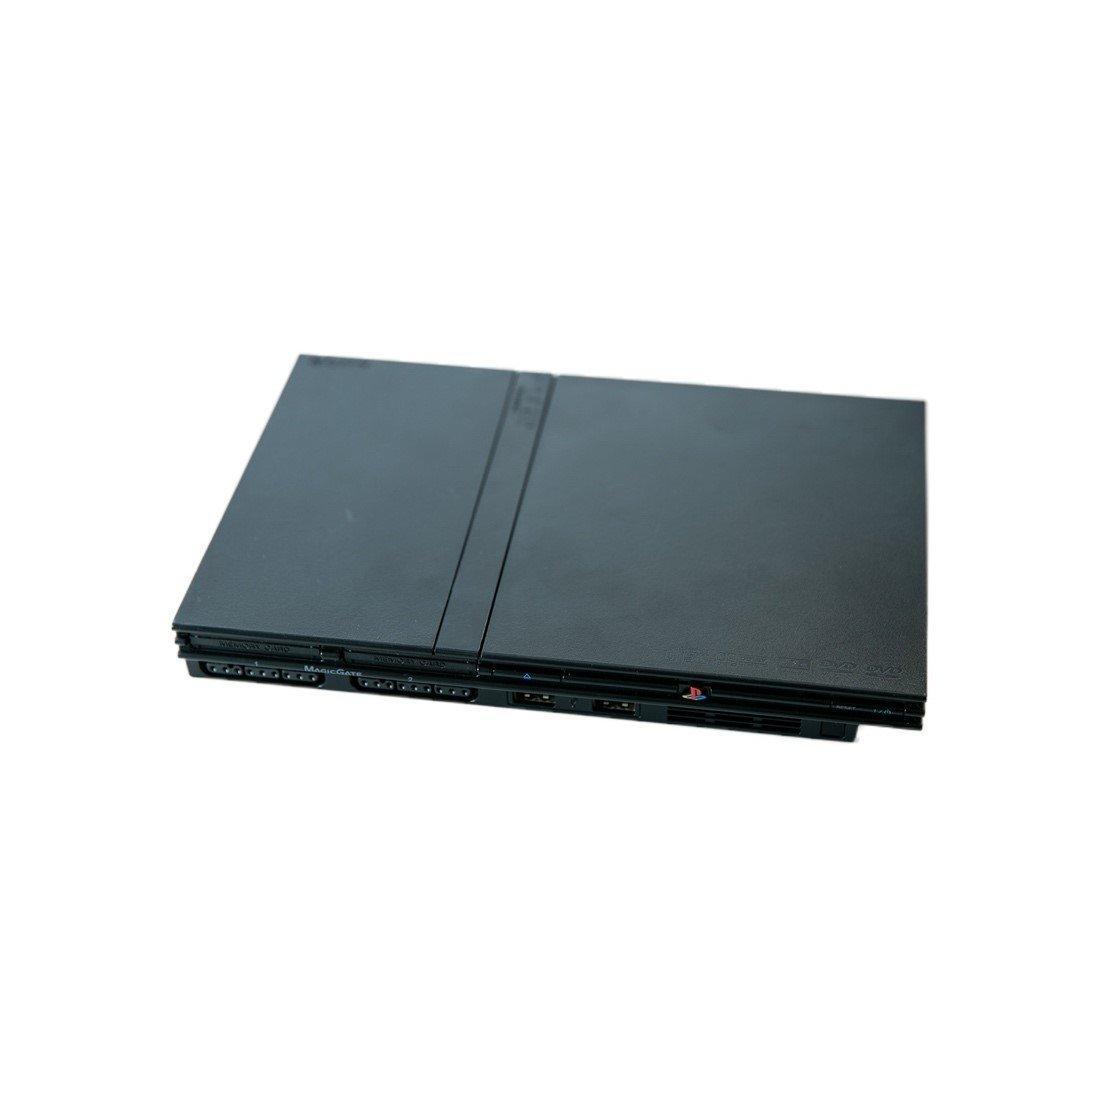 playstation 2 slim system